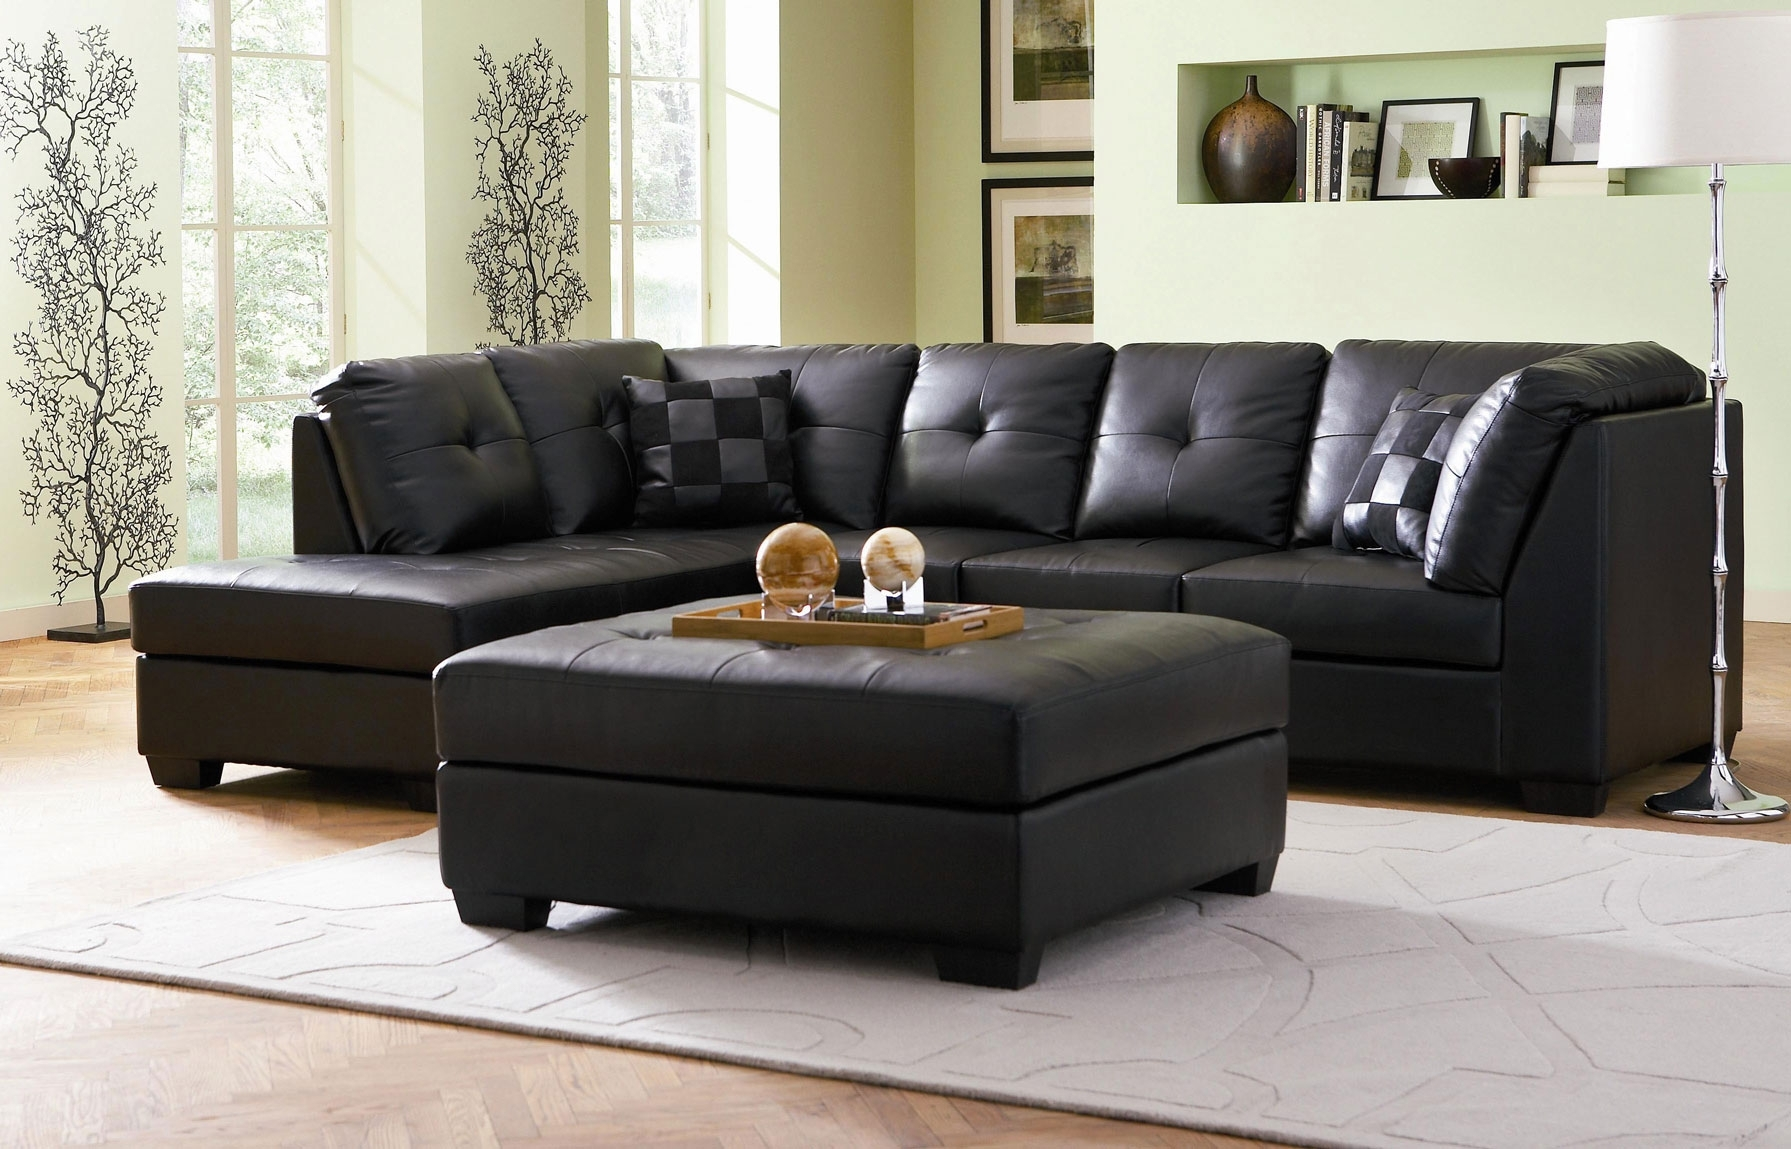 sofa mart sectional princeton 100 top grain leather in a tri tone finish 2018 latest wilmington nc sofas ideas